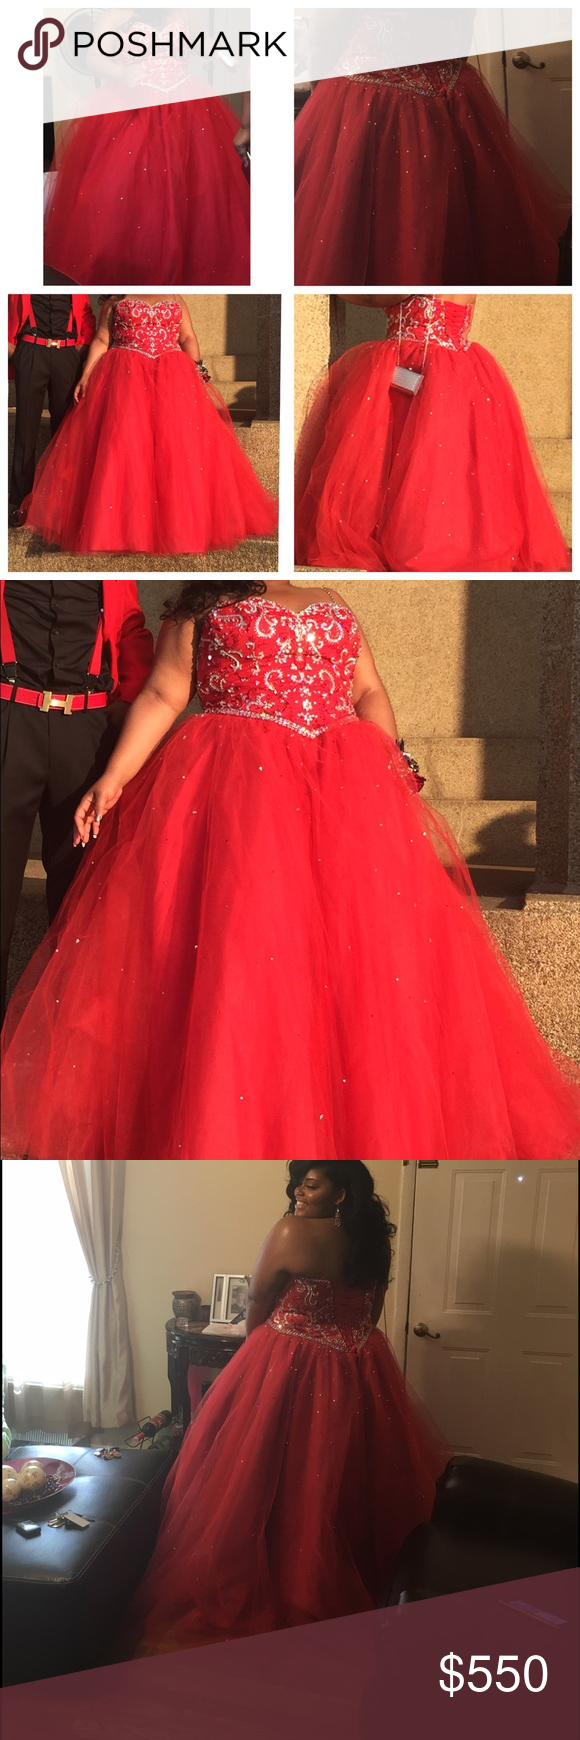 Prom Dress   My Posh Picks by Ceola Page   Pinterest   Prom night ...